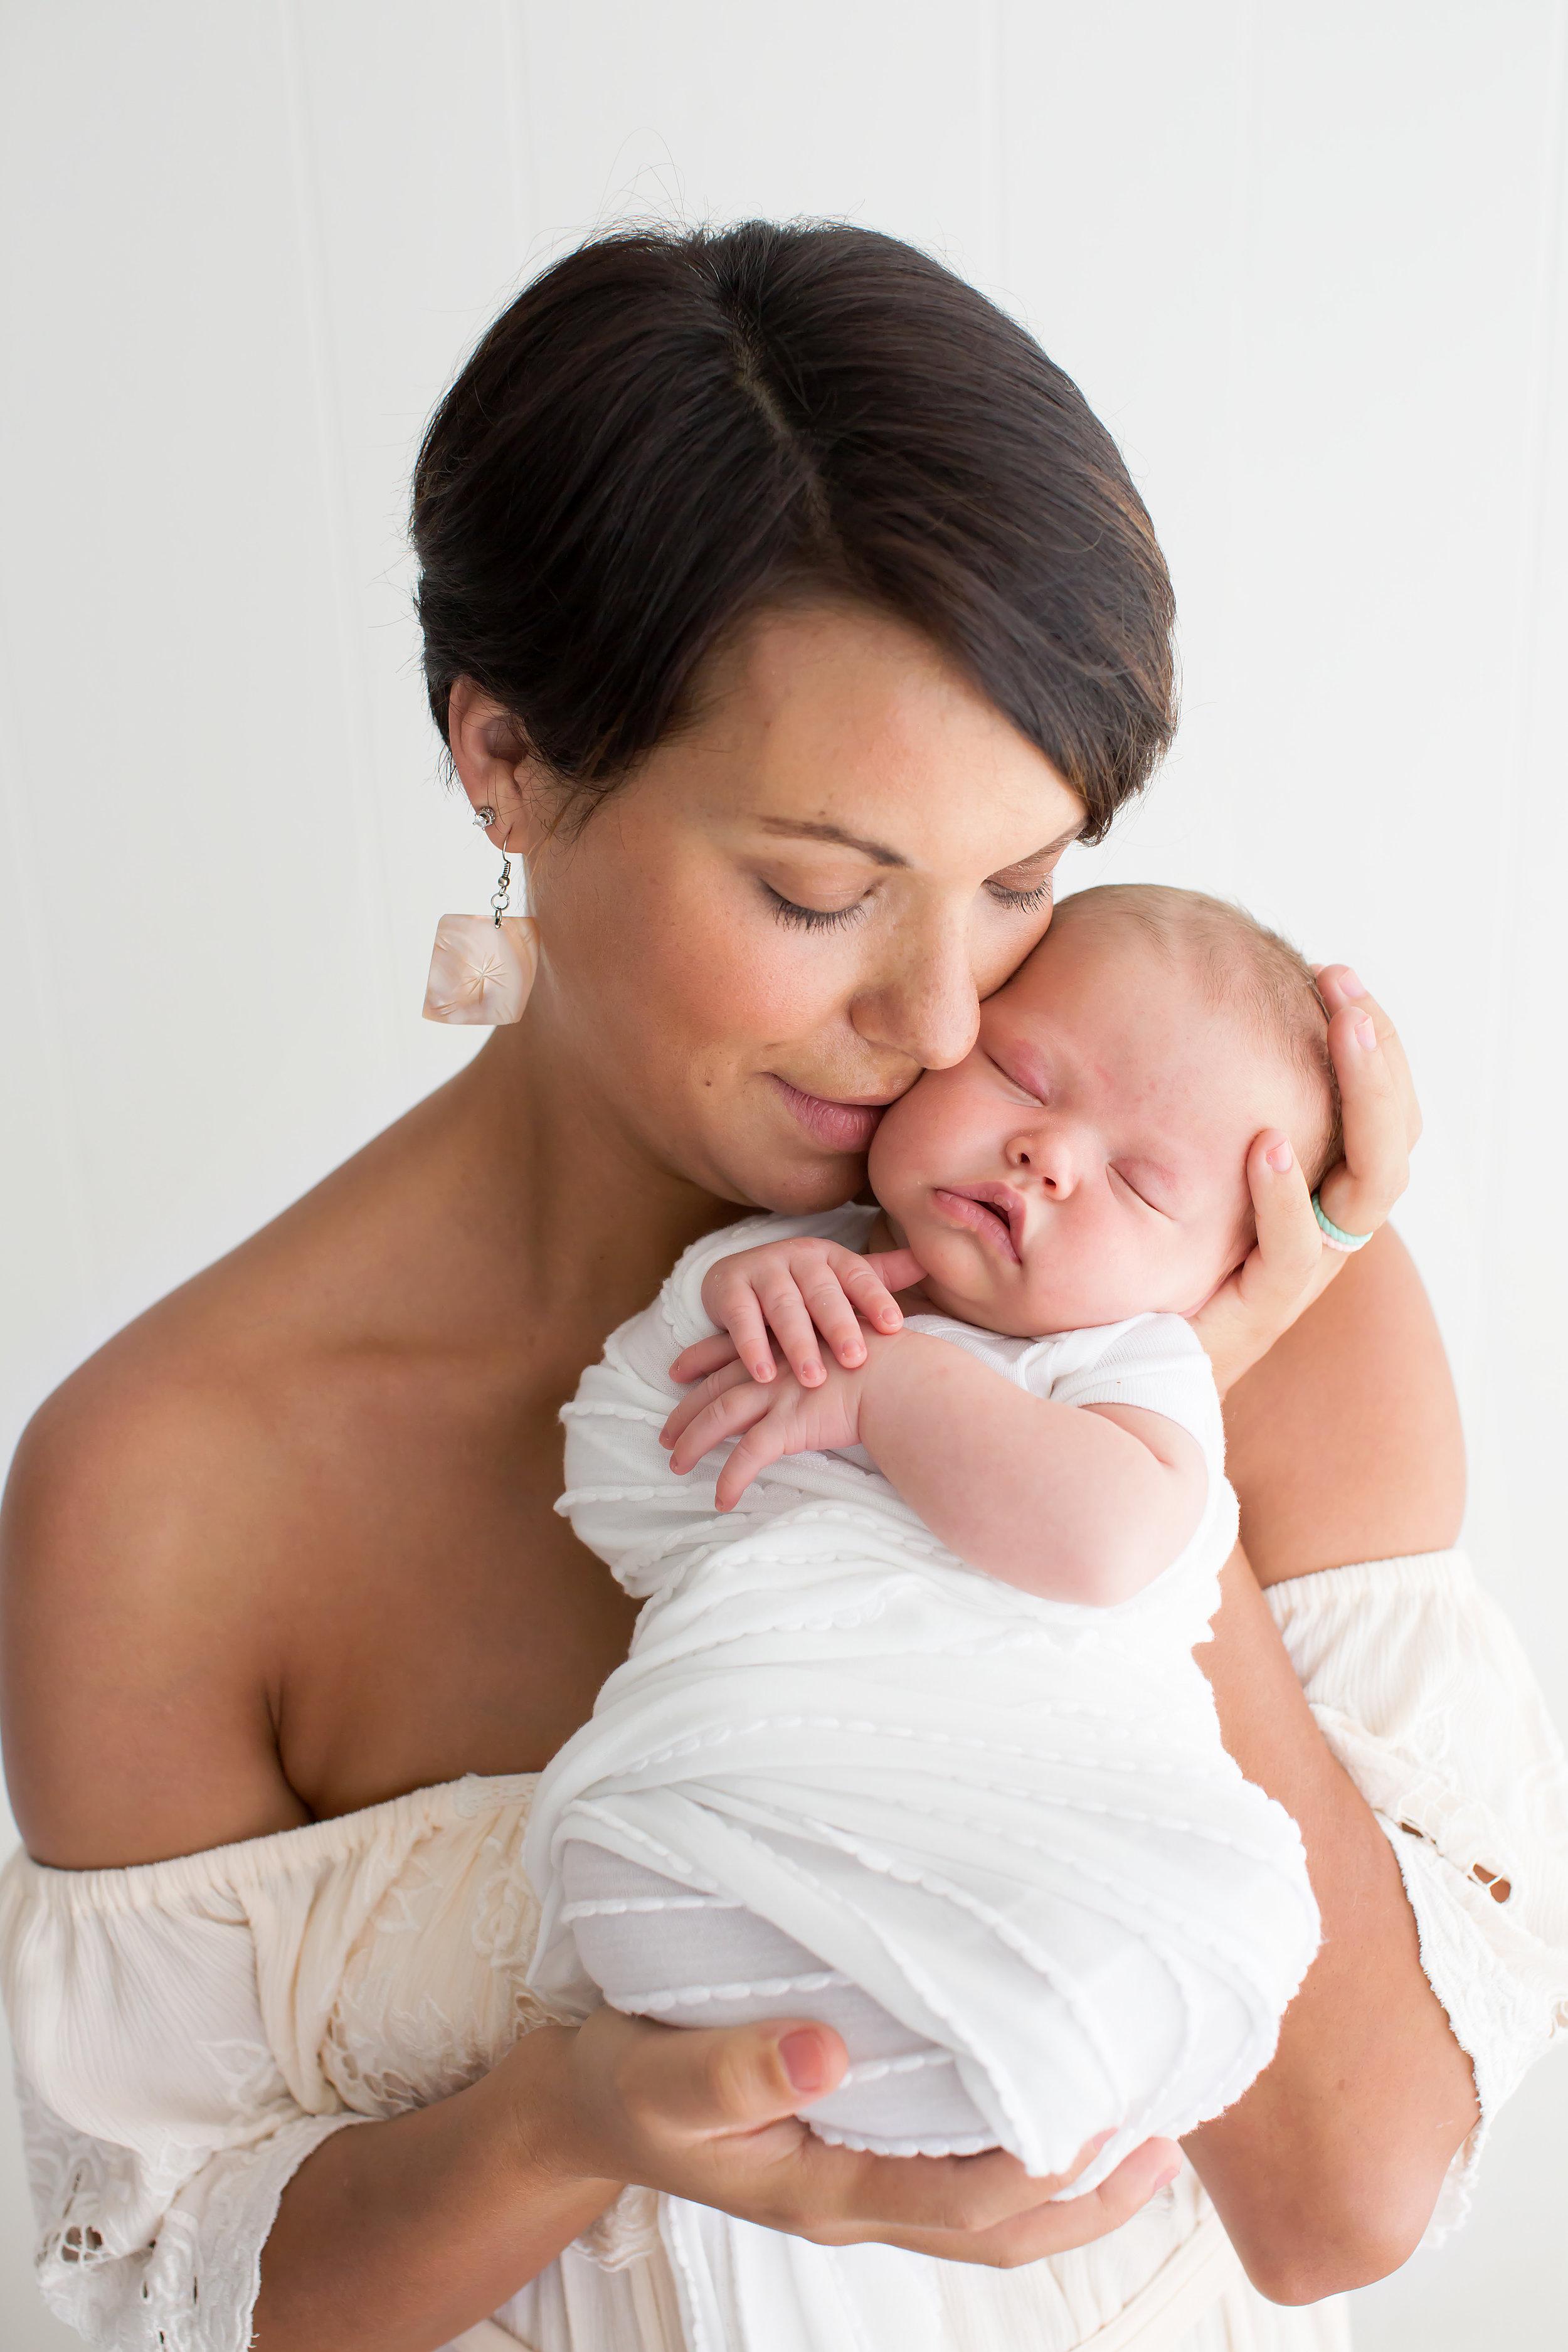 mom and baby 2.jpg